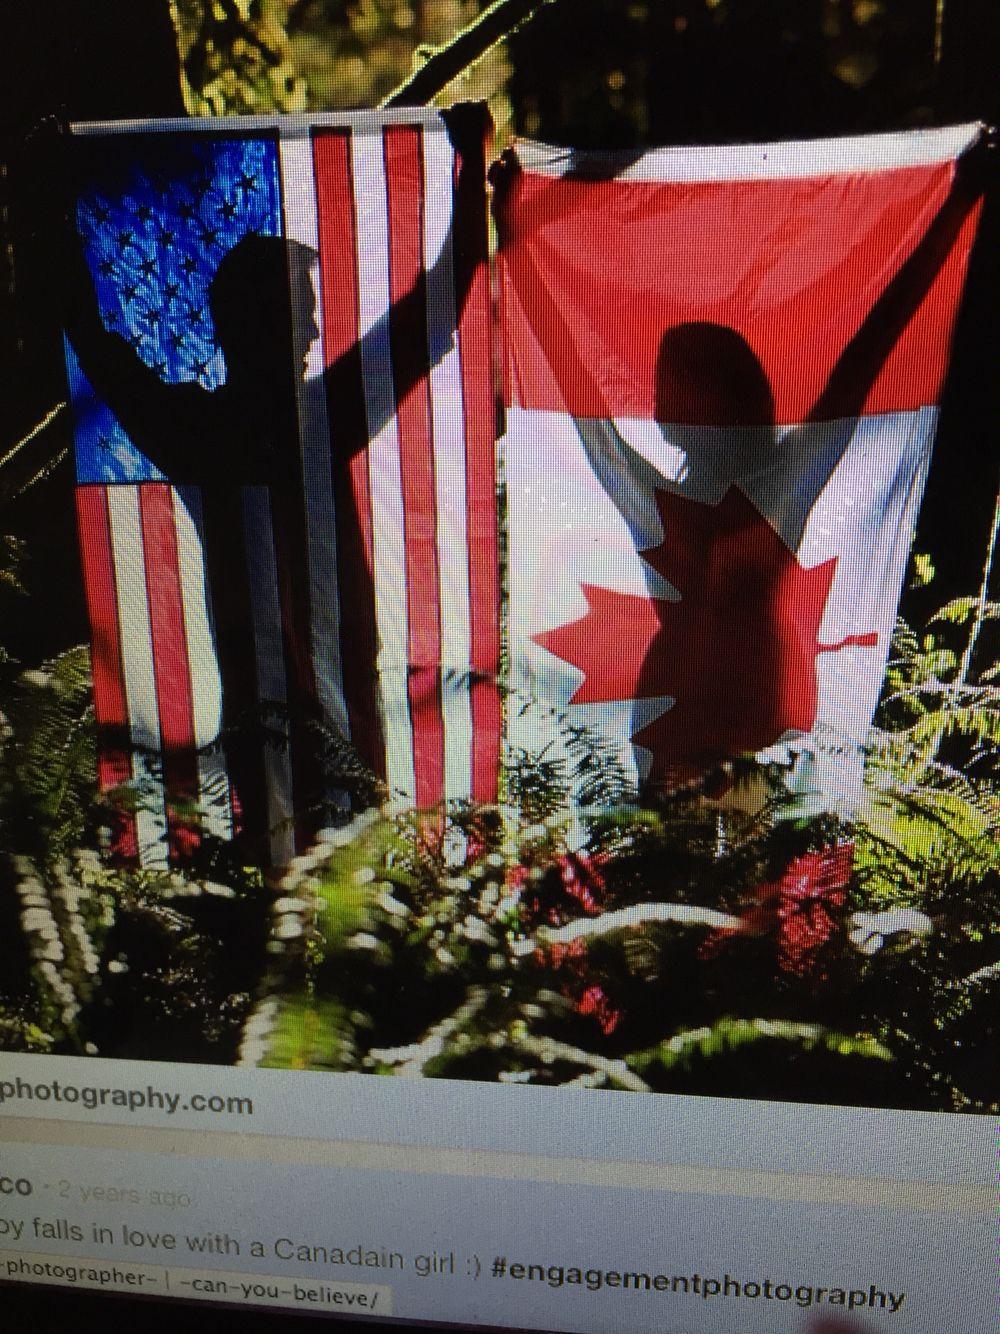 Photos | Jamaica Destination Wedding Ideas | Pinterest | Jamaica ...